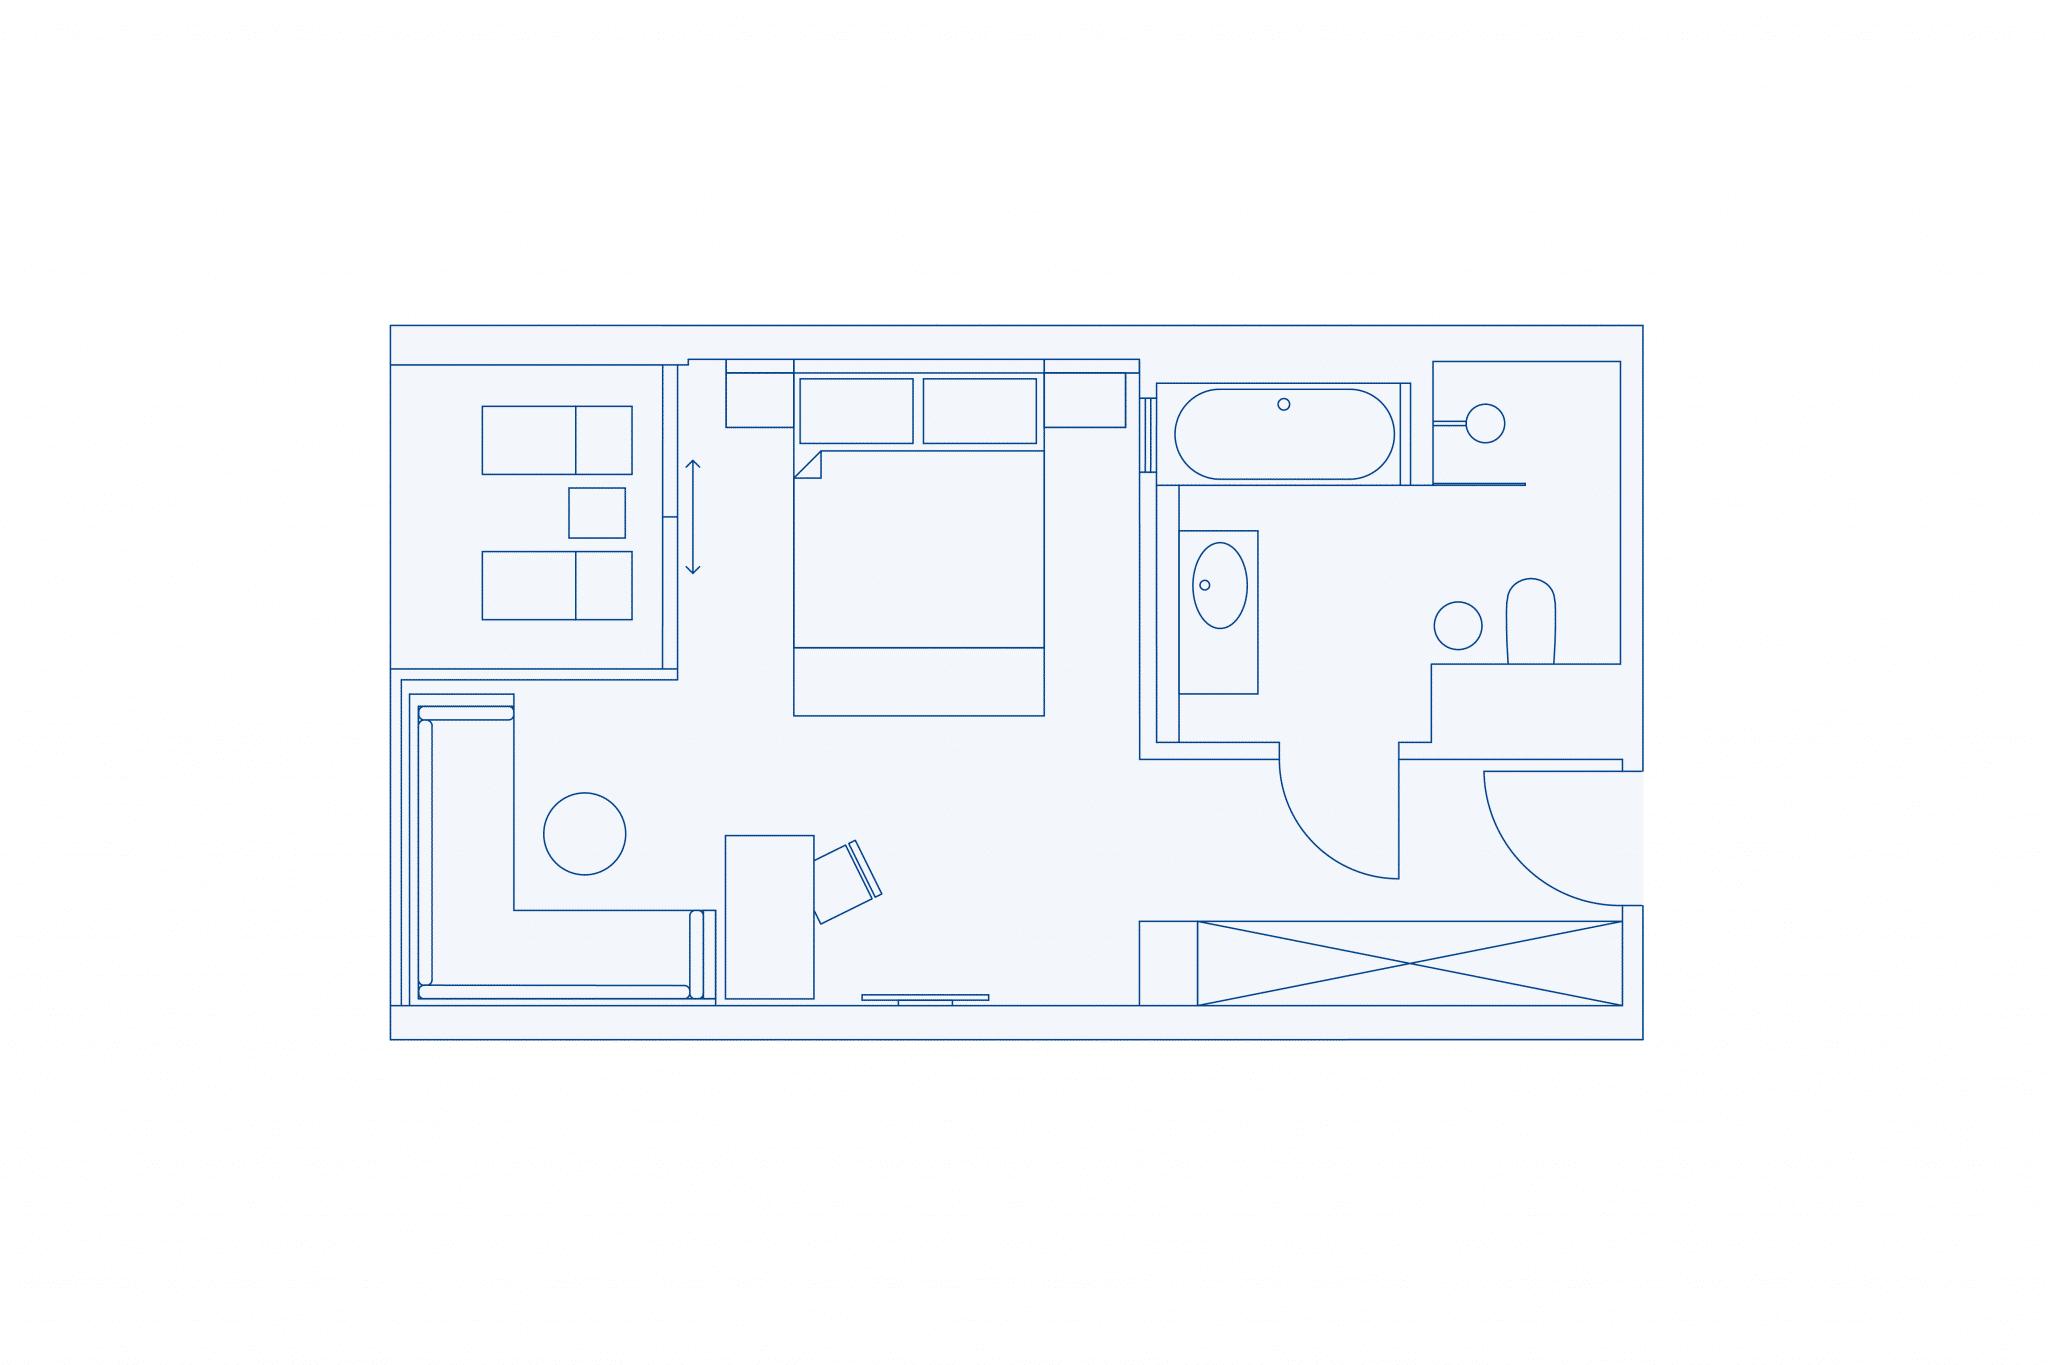 Room layout comort room at VIVAMAYR Altaussee